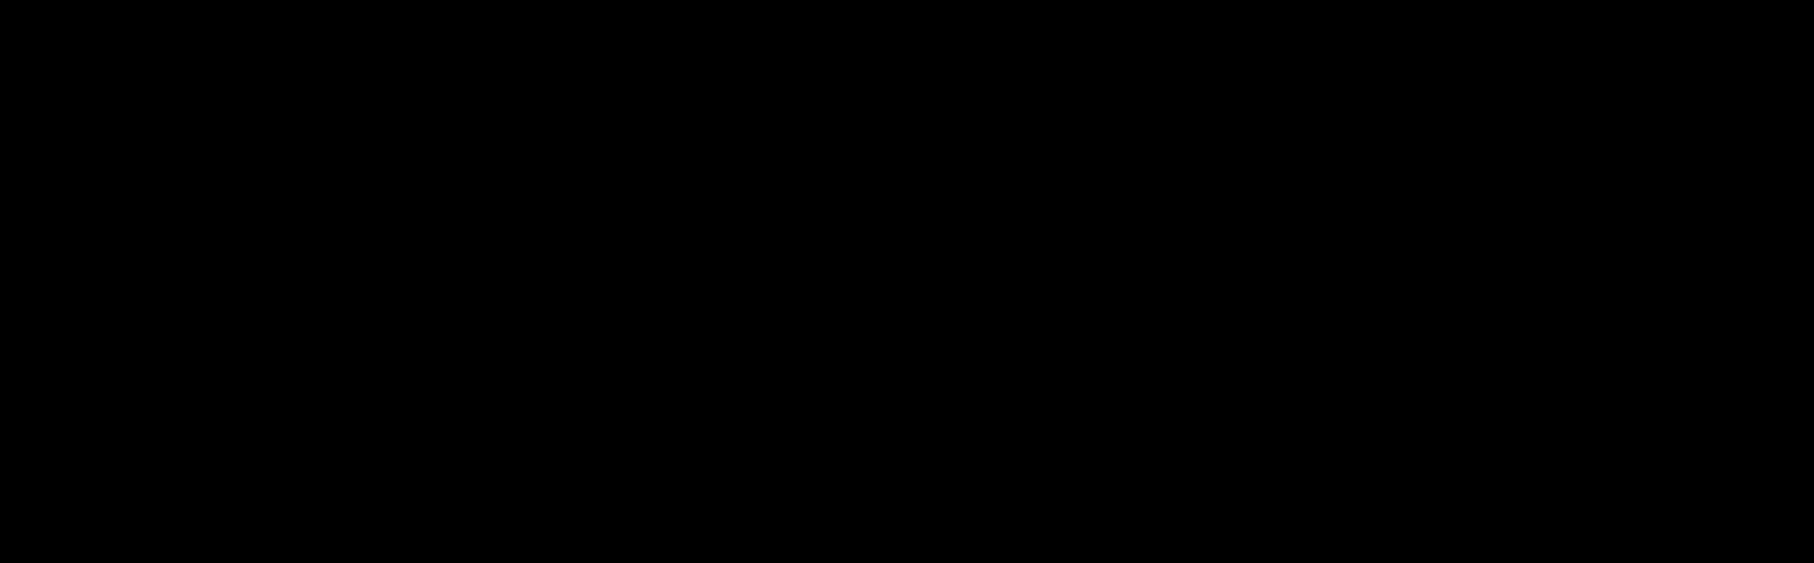 rac-Epinephrine glucuronide